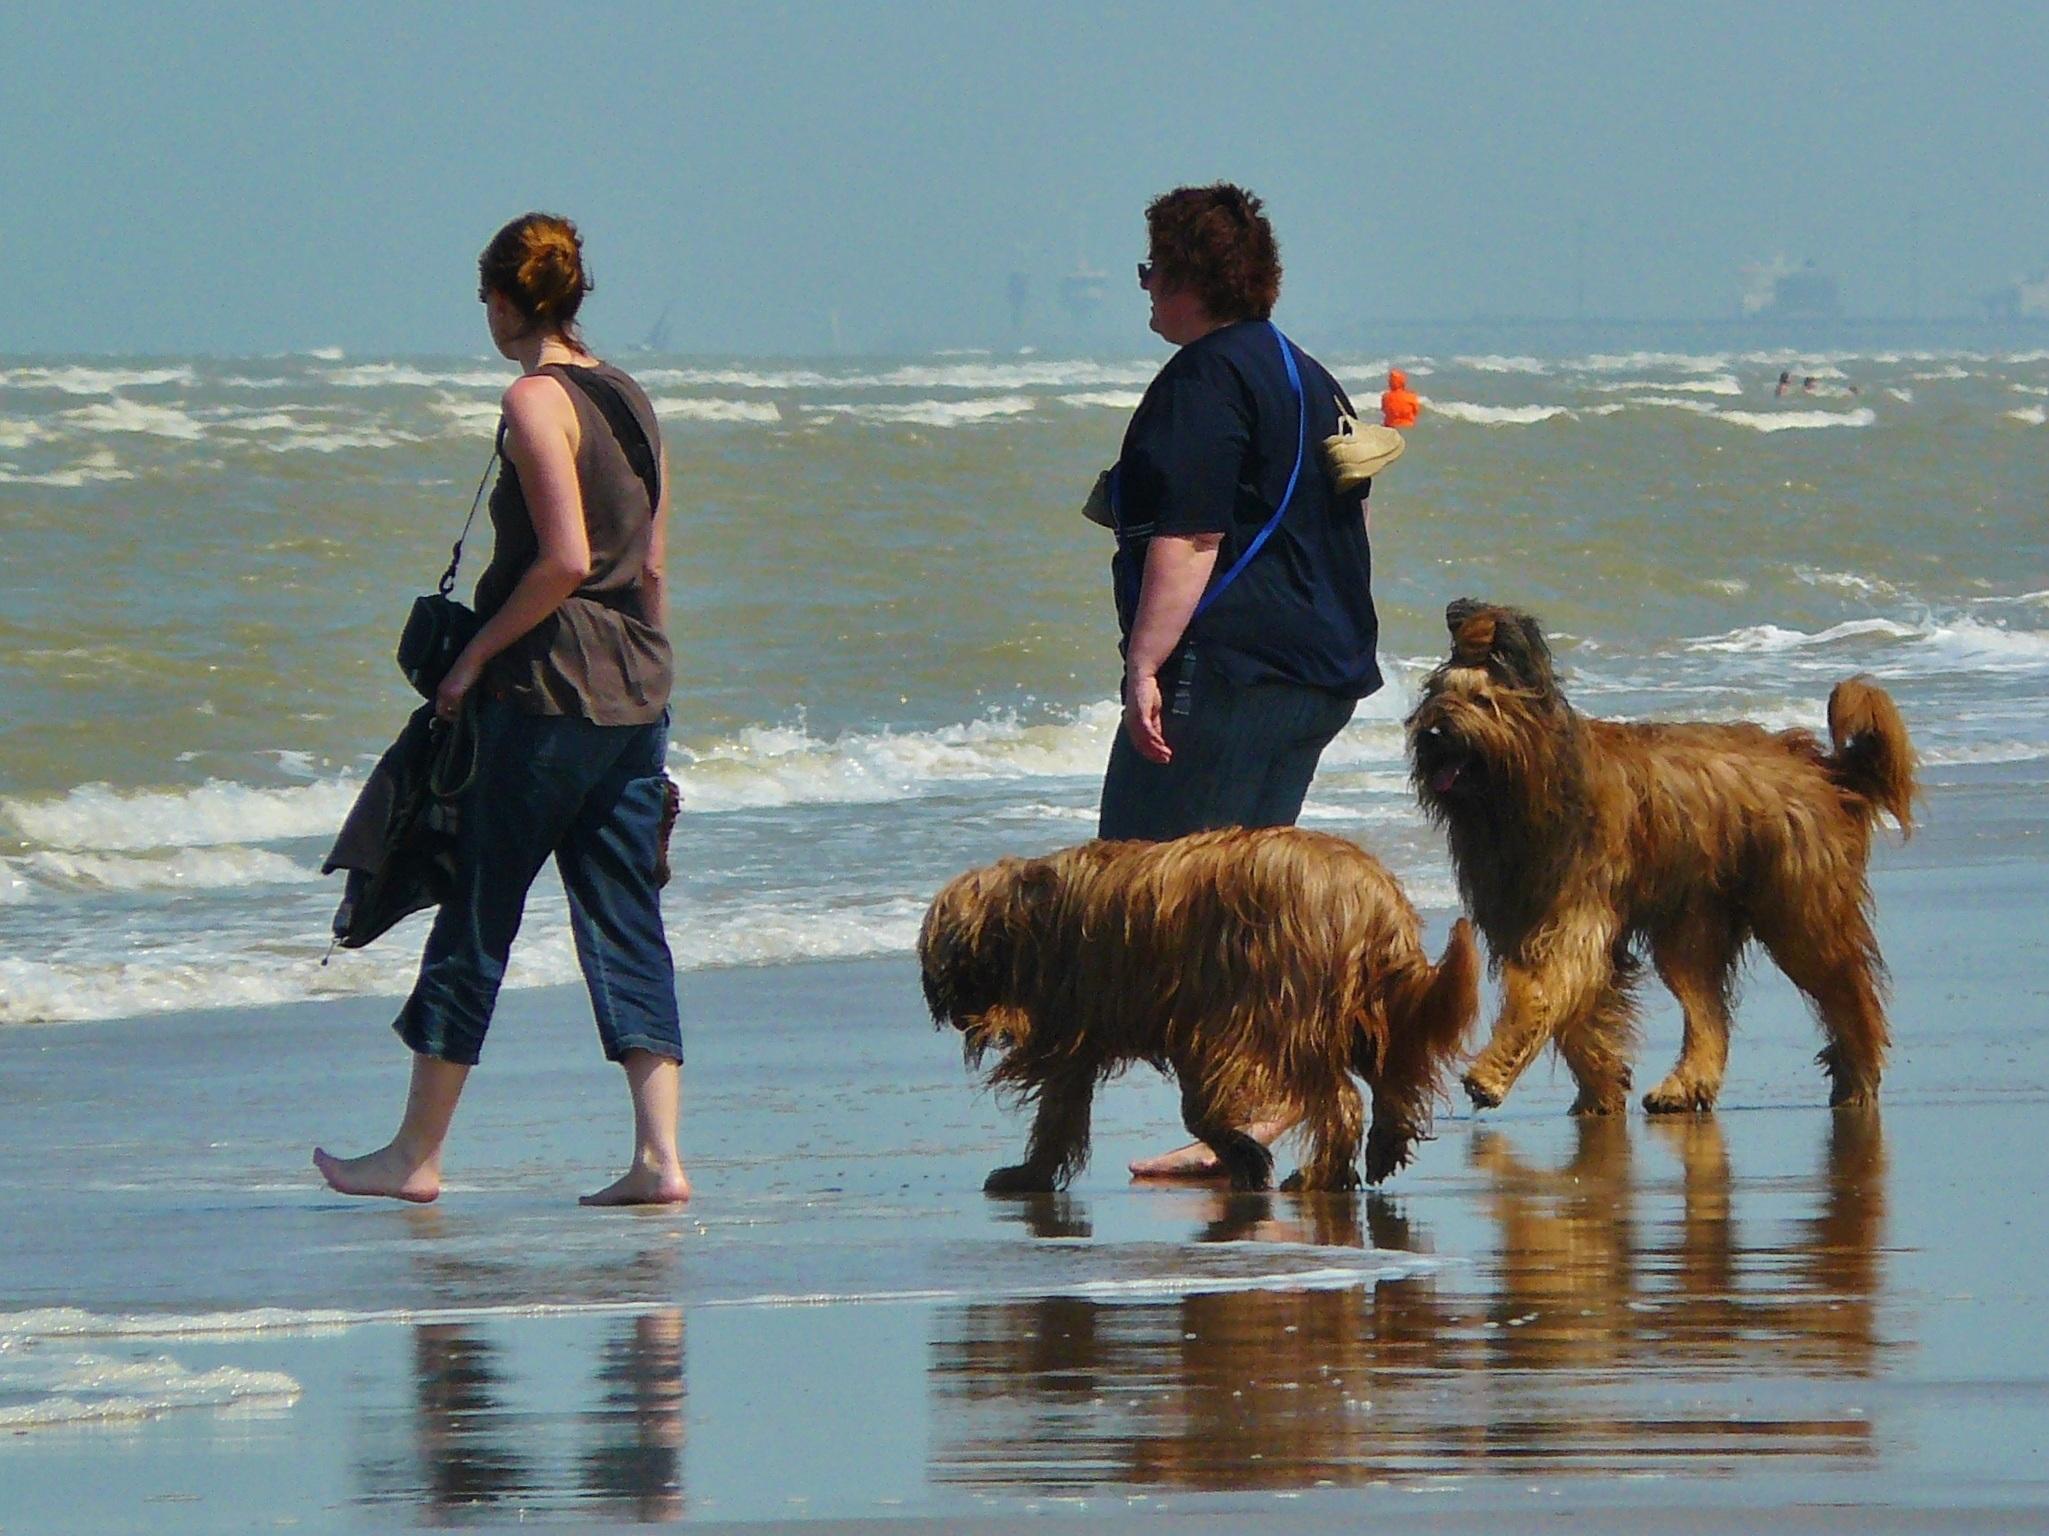 Family Members, Animal, Beach, Dog, Family, HQ Photo